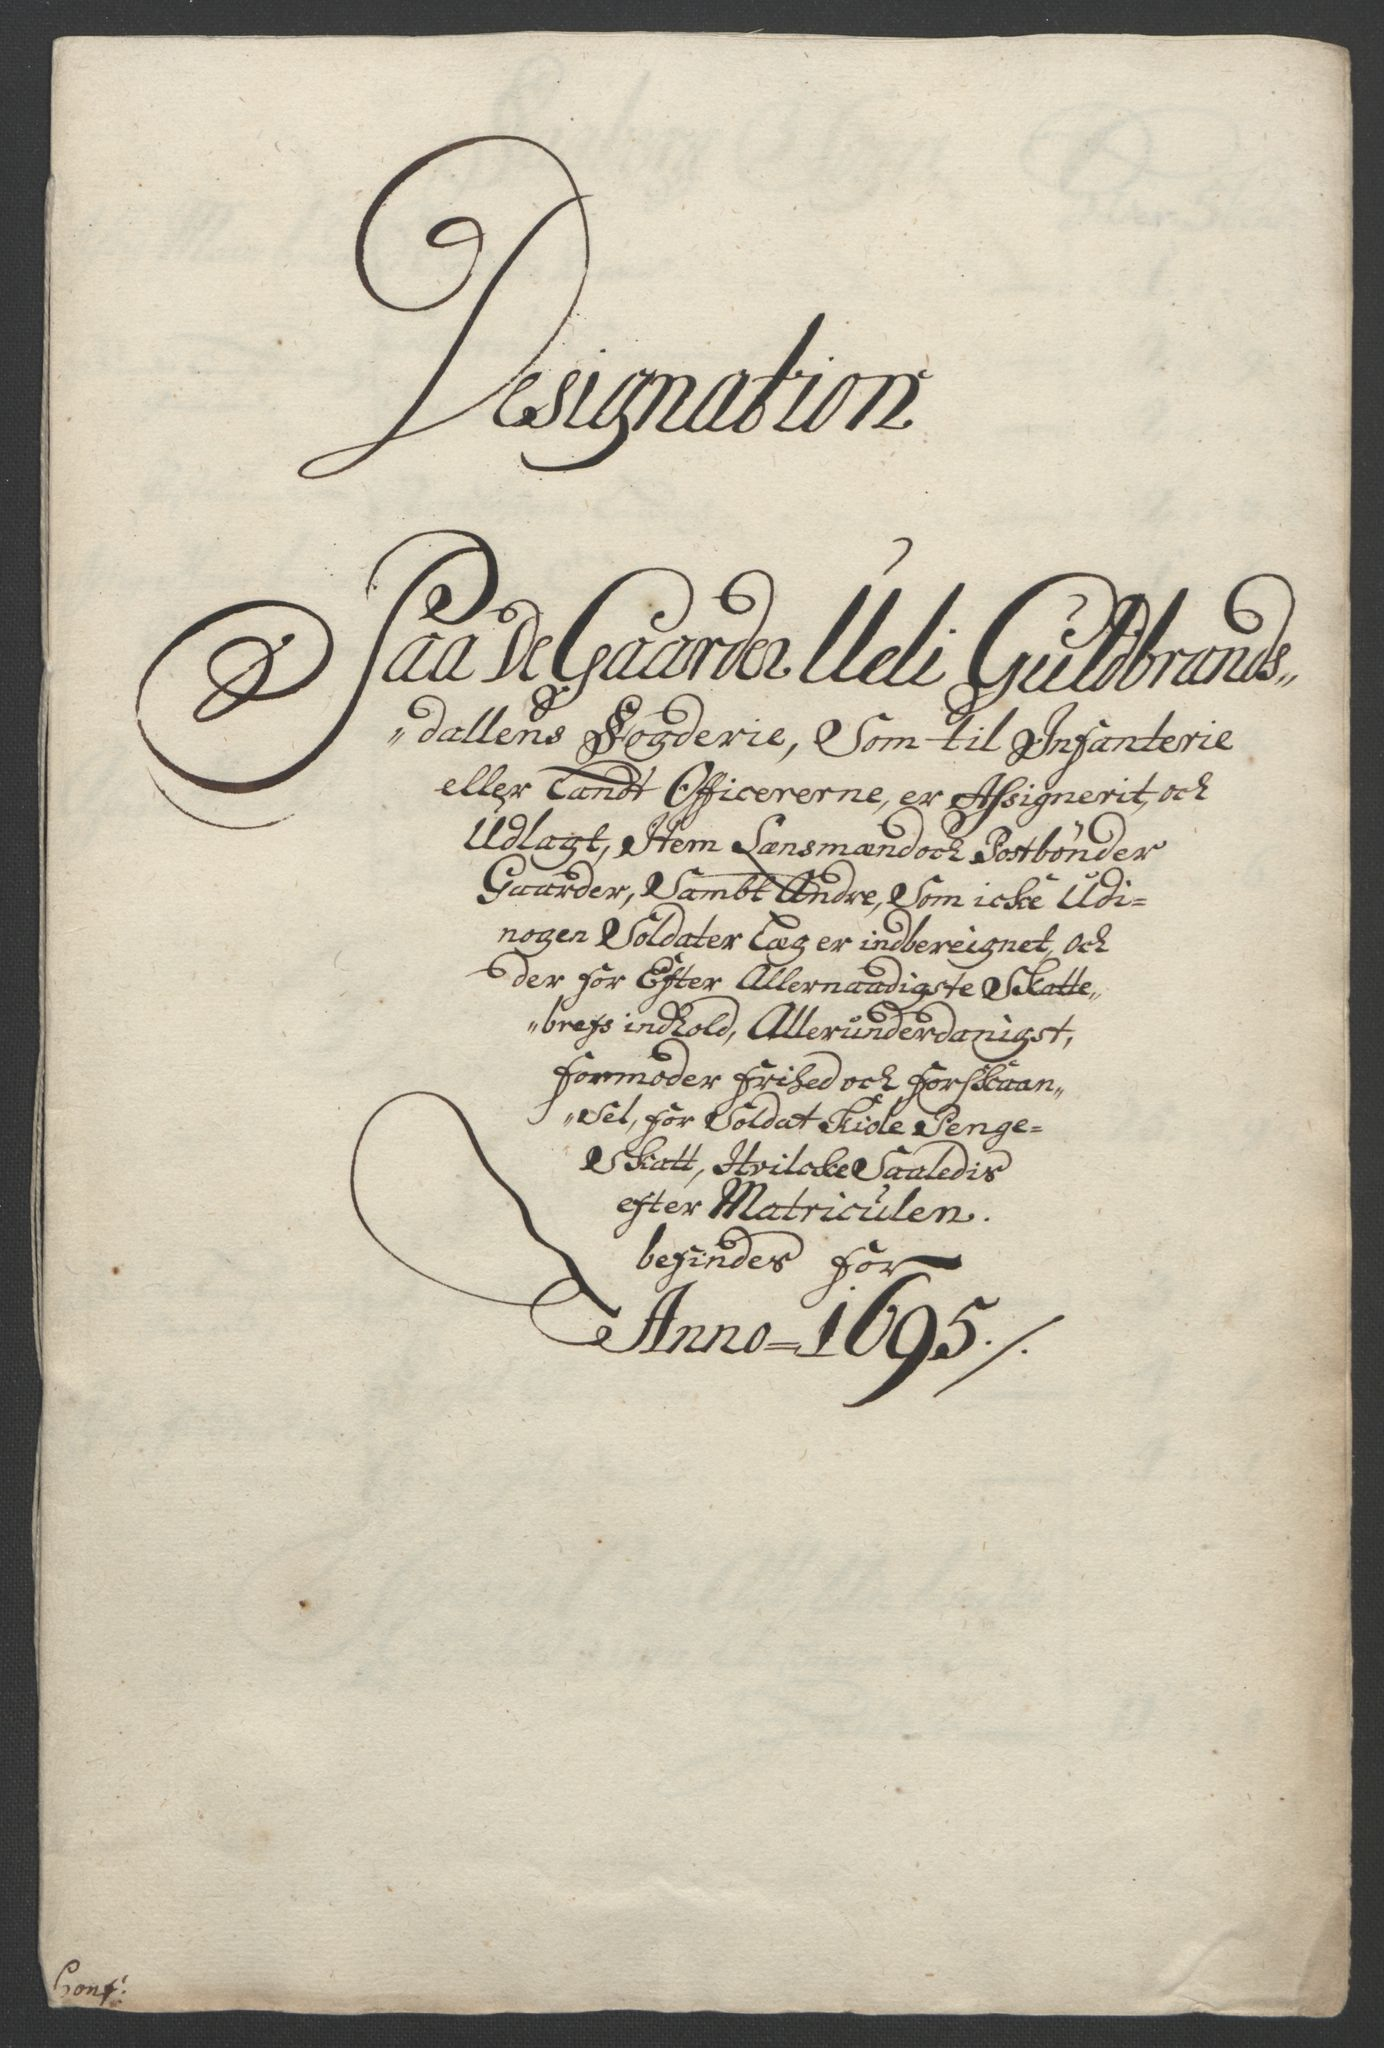 RA, Rentekammeret inntil 1814, Reviderte regnskaper, Fogderegnskap, R17/L1169: Fogderegnskap Gudbrandsdal, 1695, s. 134